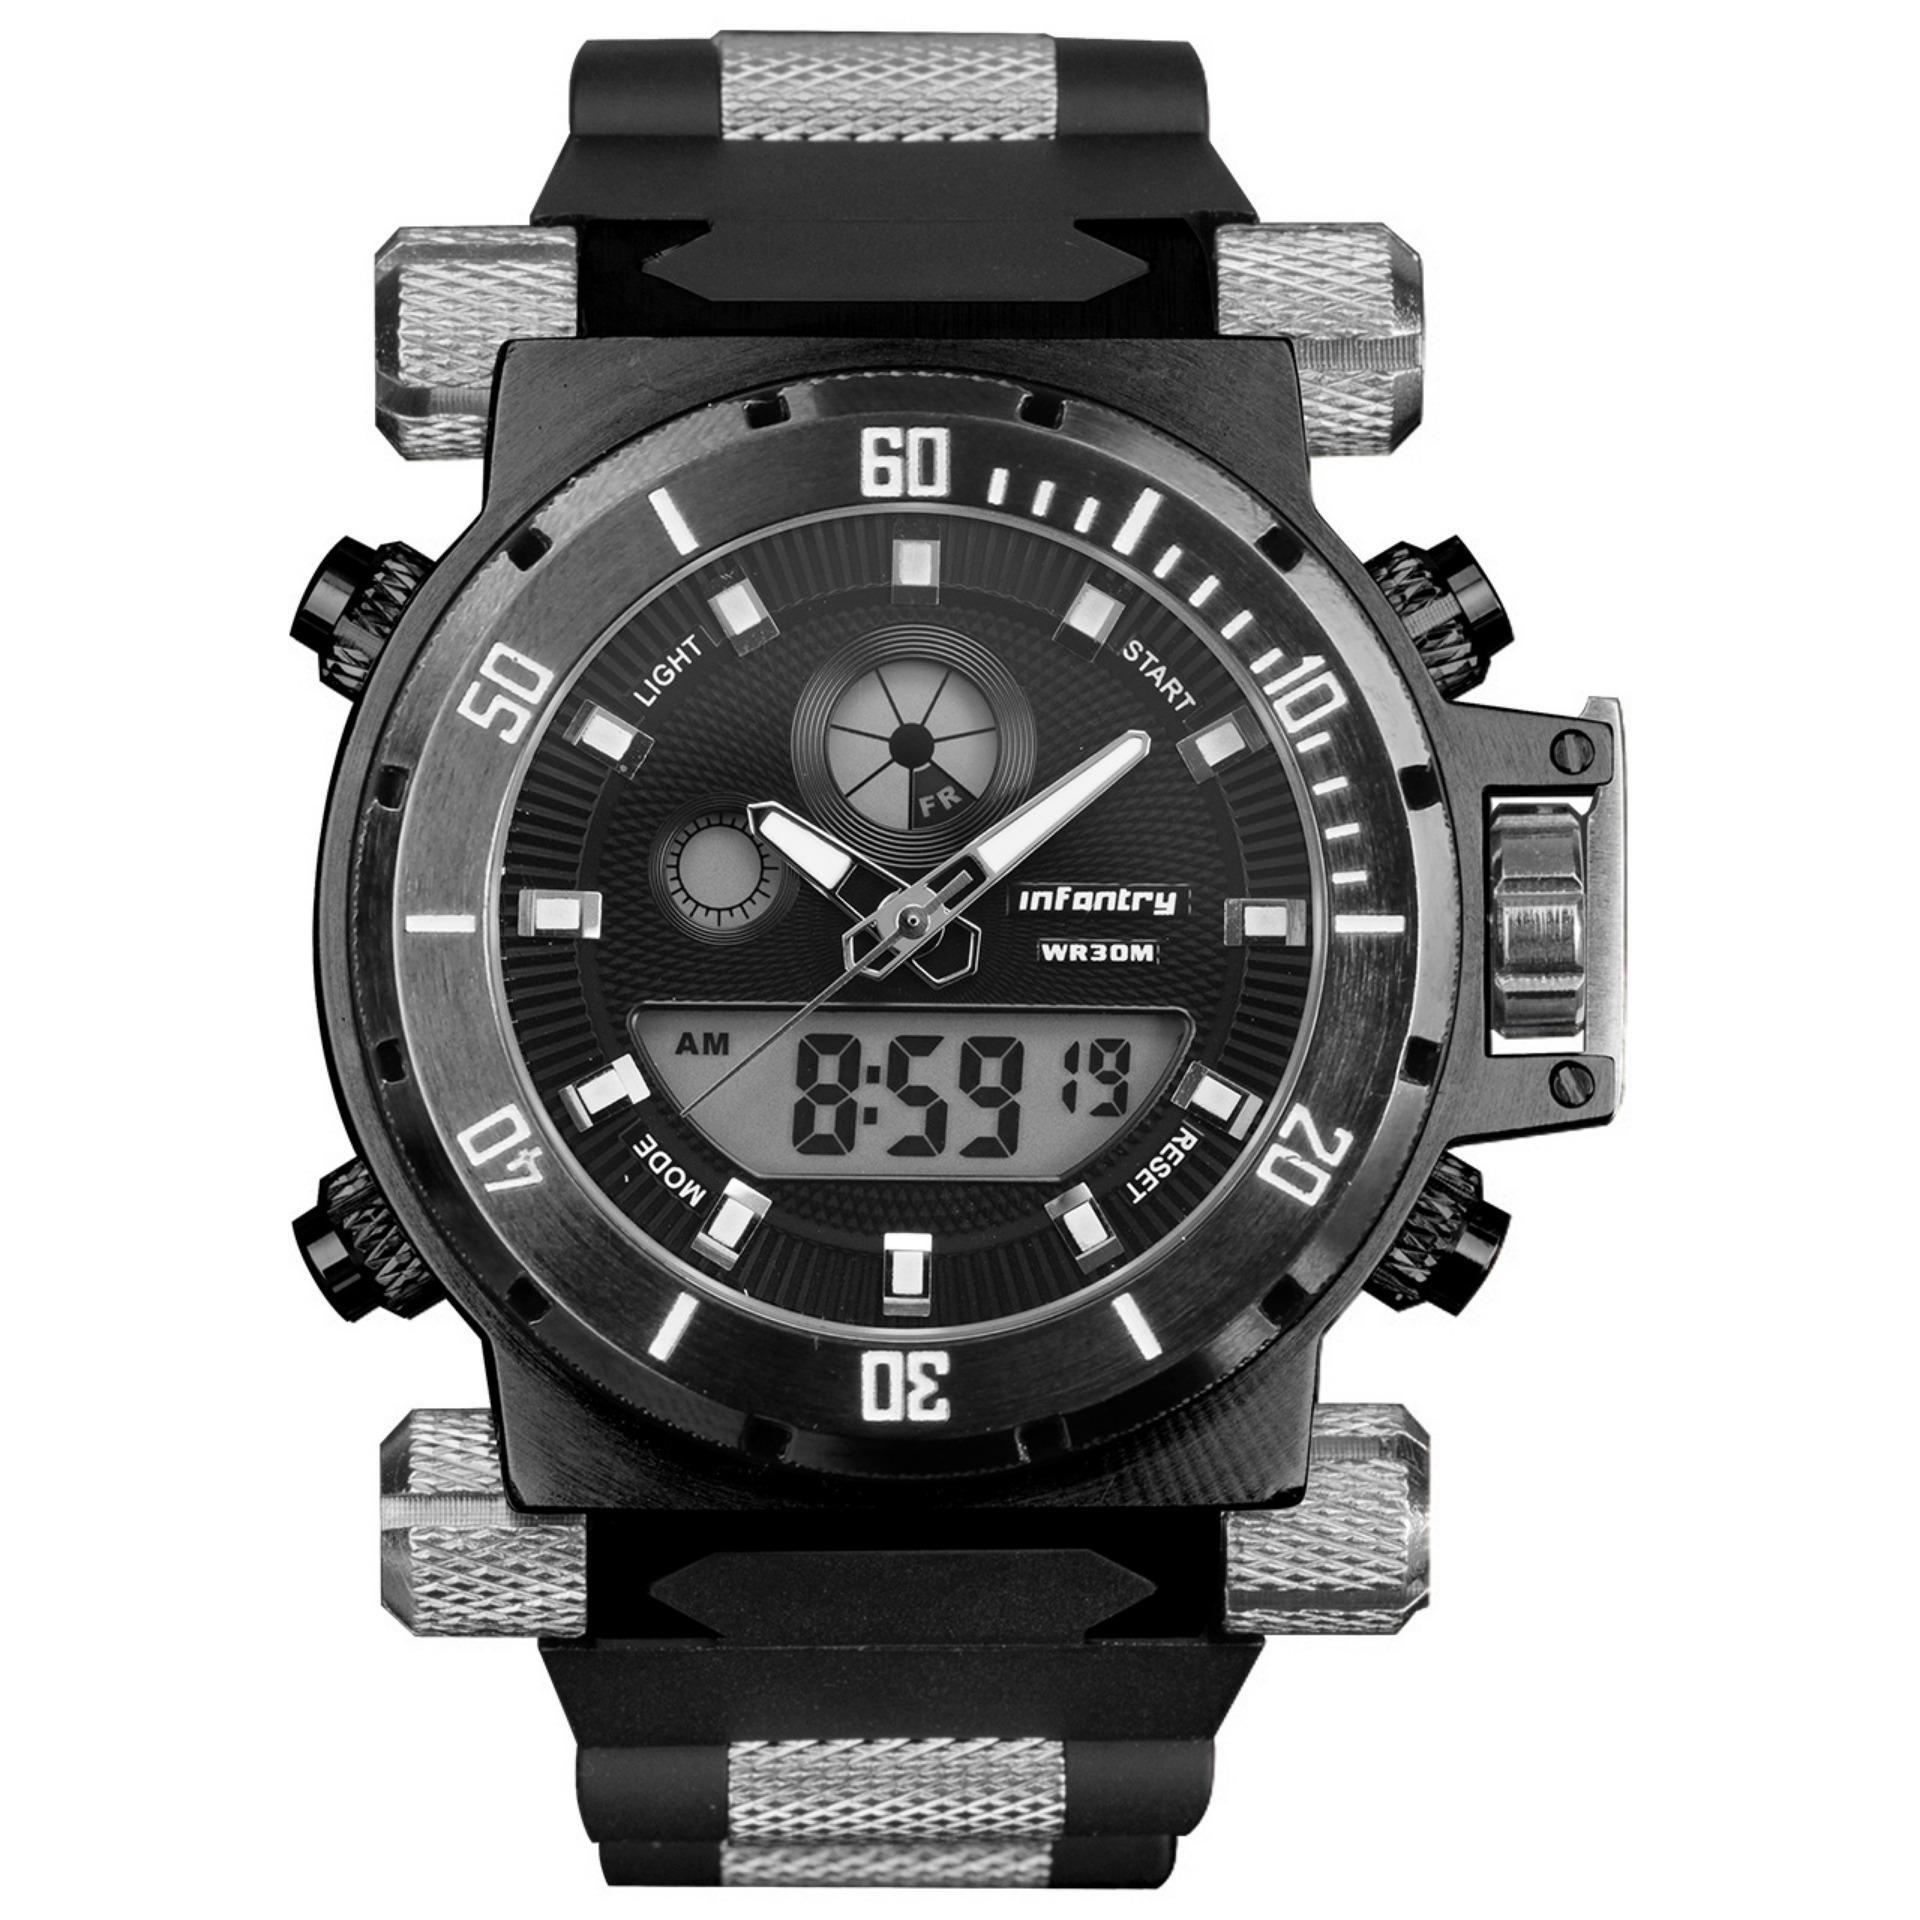 ... INFANTRY Mens Digital Quartz Wrist Watch Dual Time Alarm Sport ArmyBlack Rubber ...